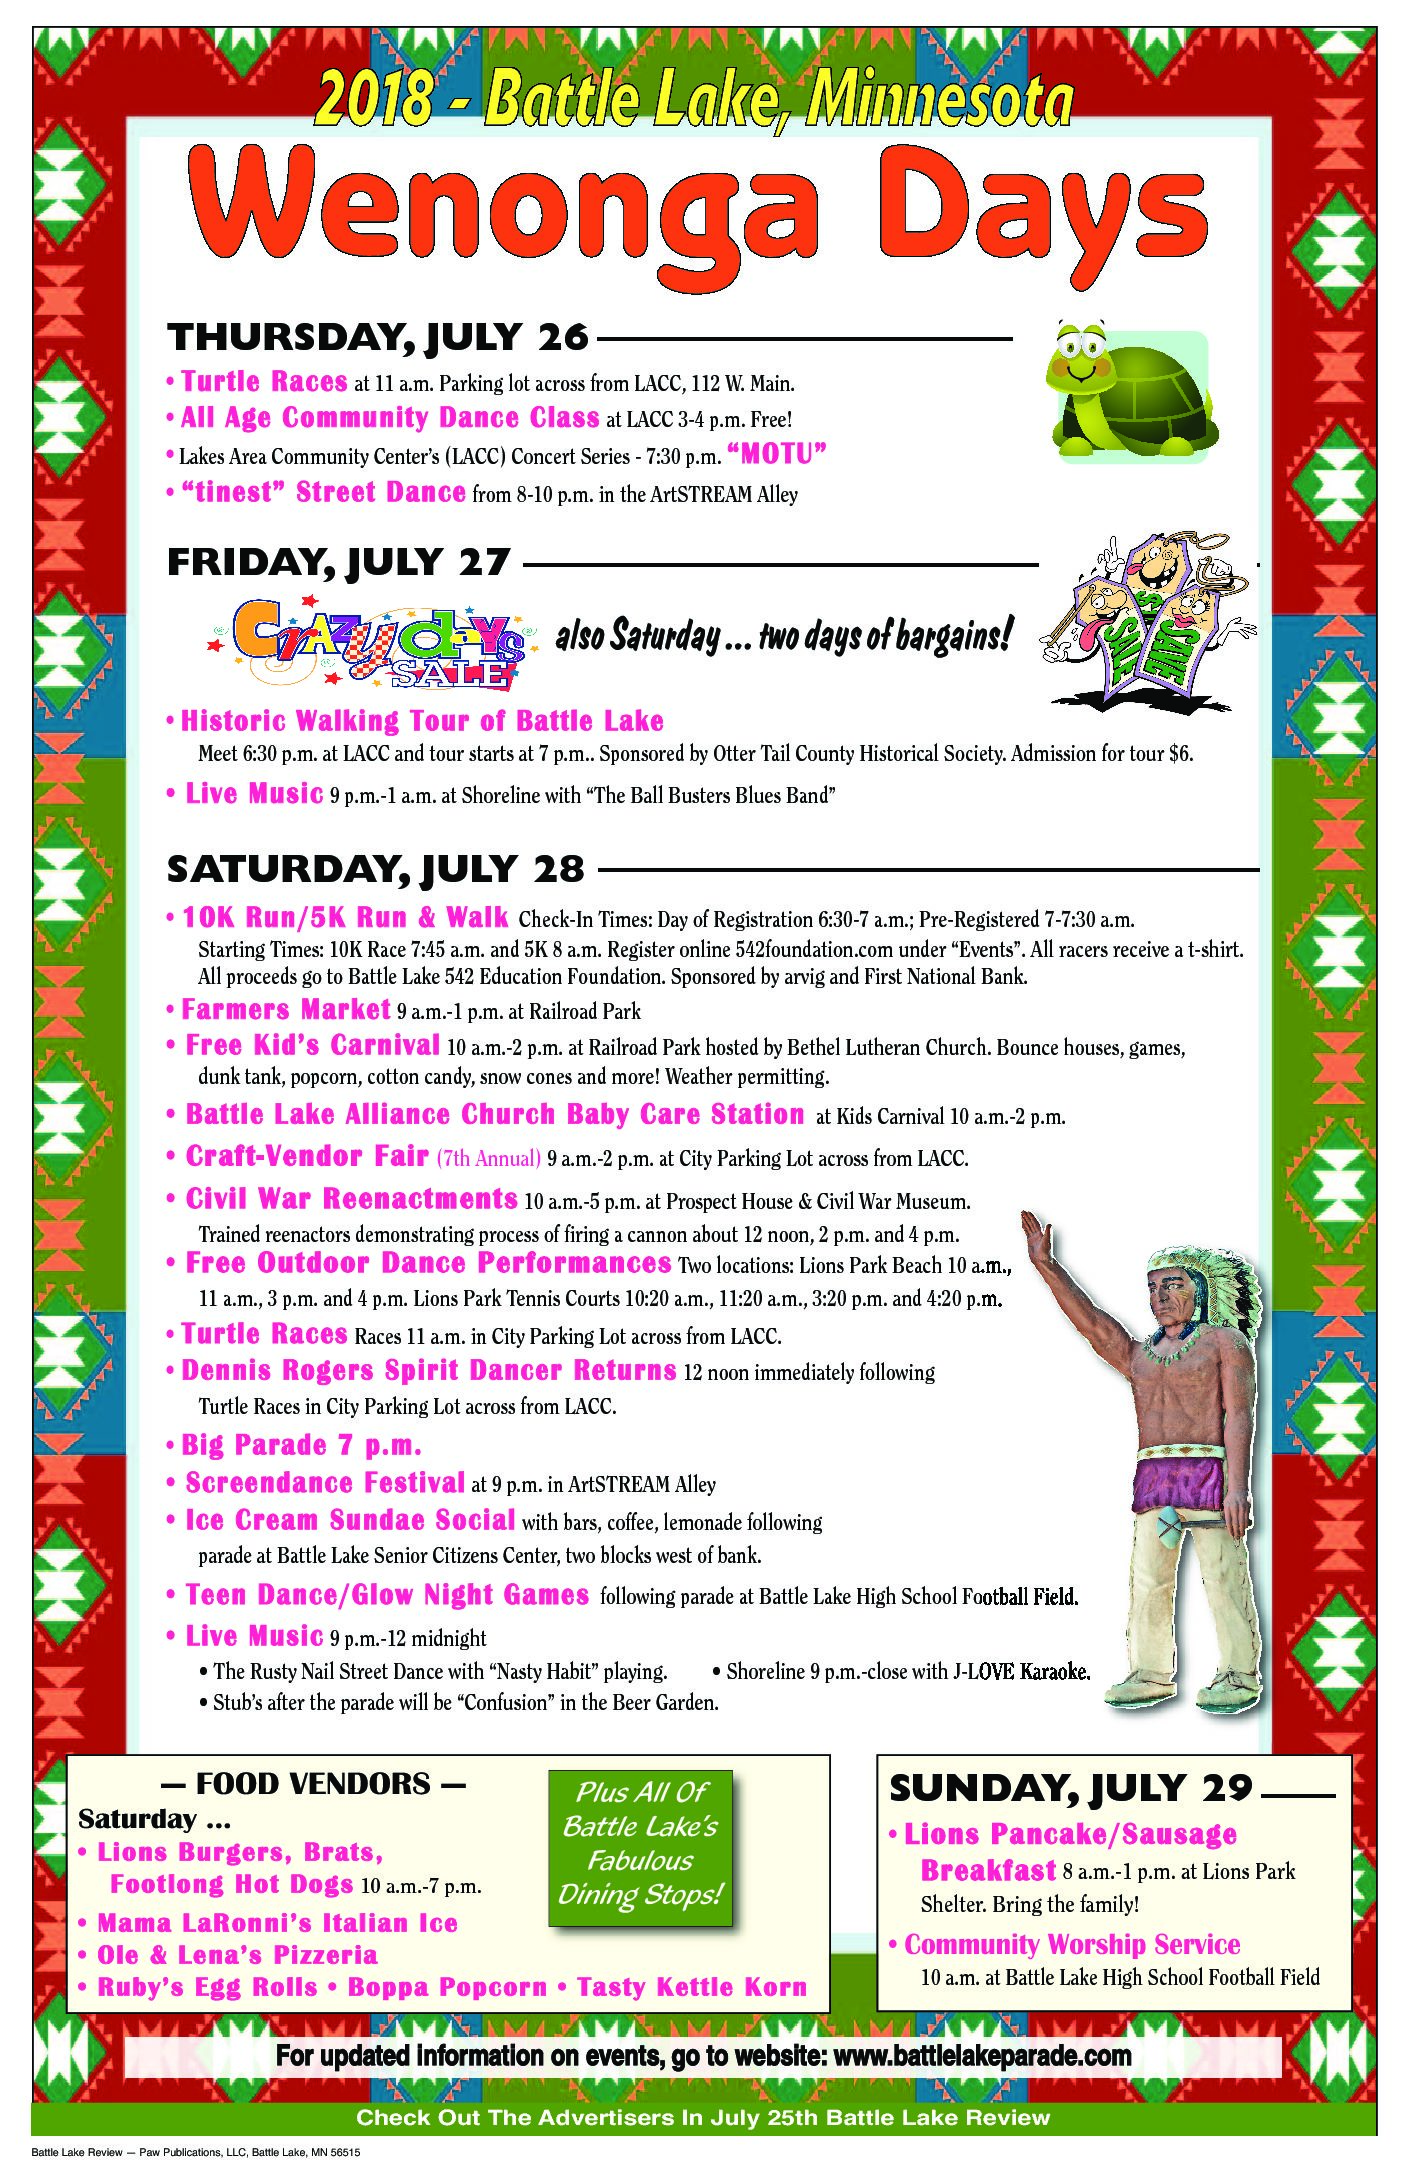 Wenonga Days Events Poster